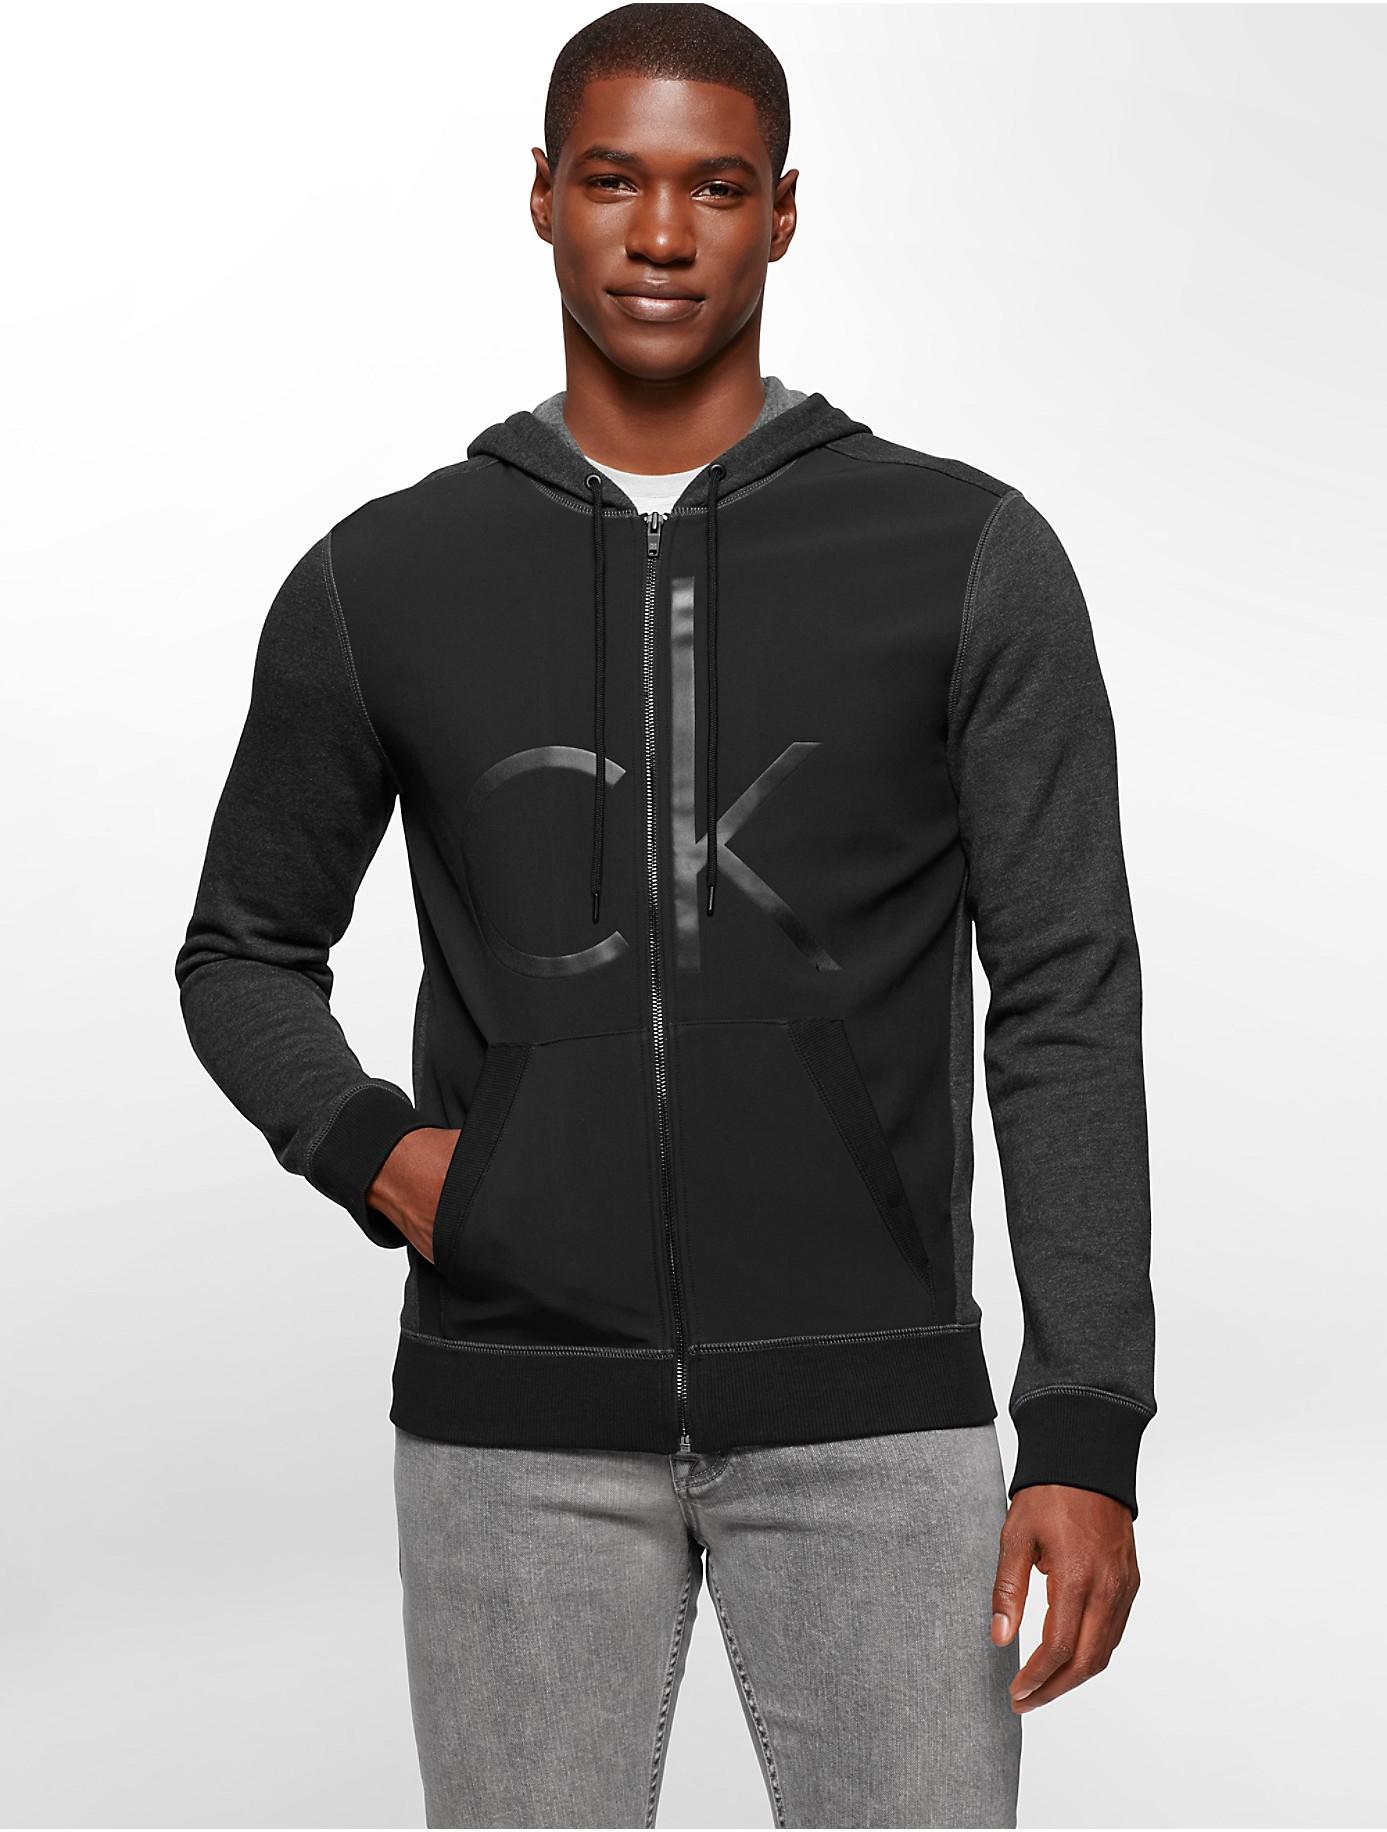 calvin klein jeans neoprene debossed logo zip front hoodie in black for men lyst. Black Bedroom Furniture Sets. Home Design Ideas